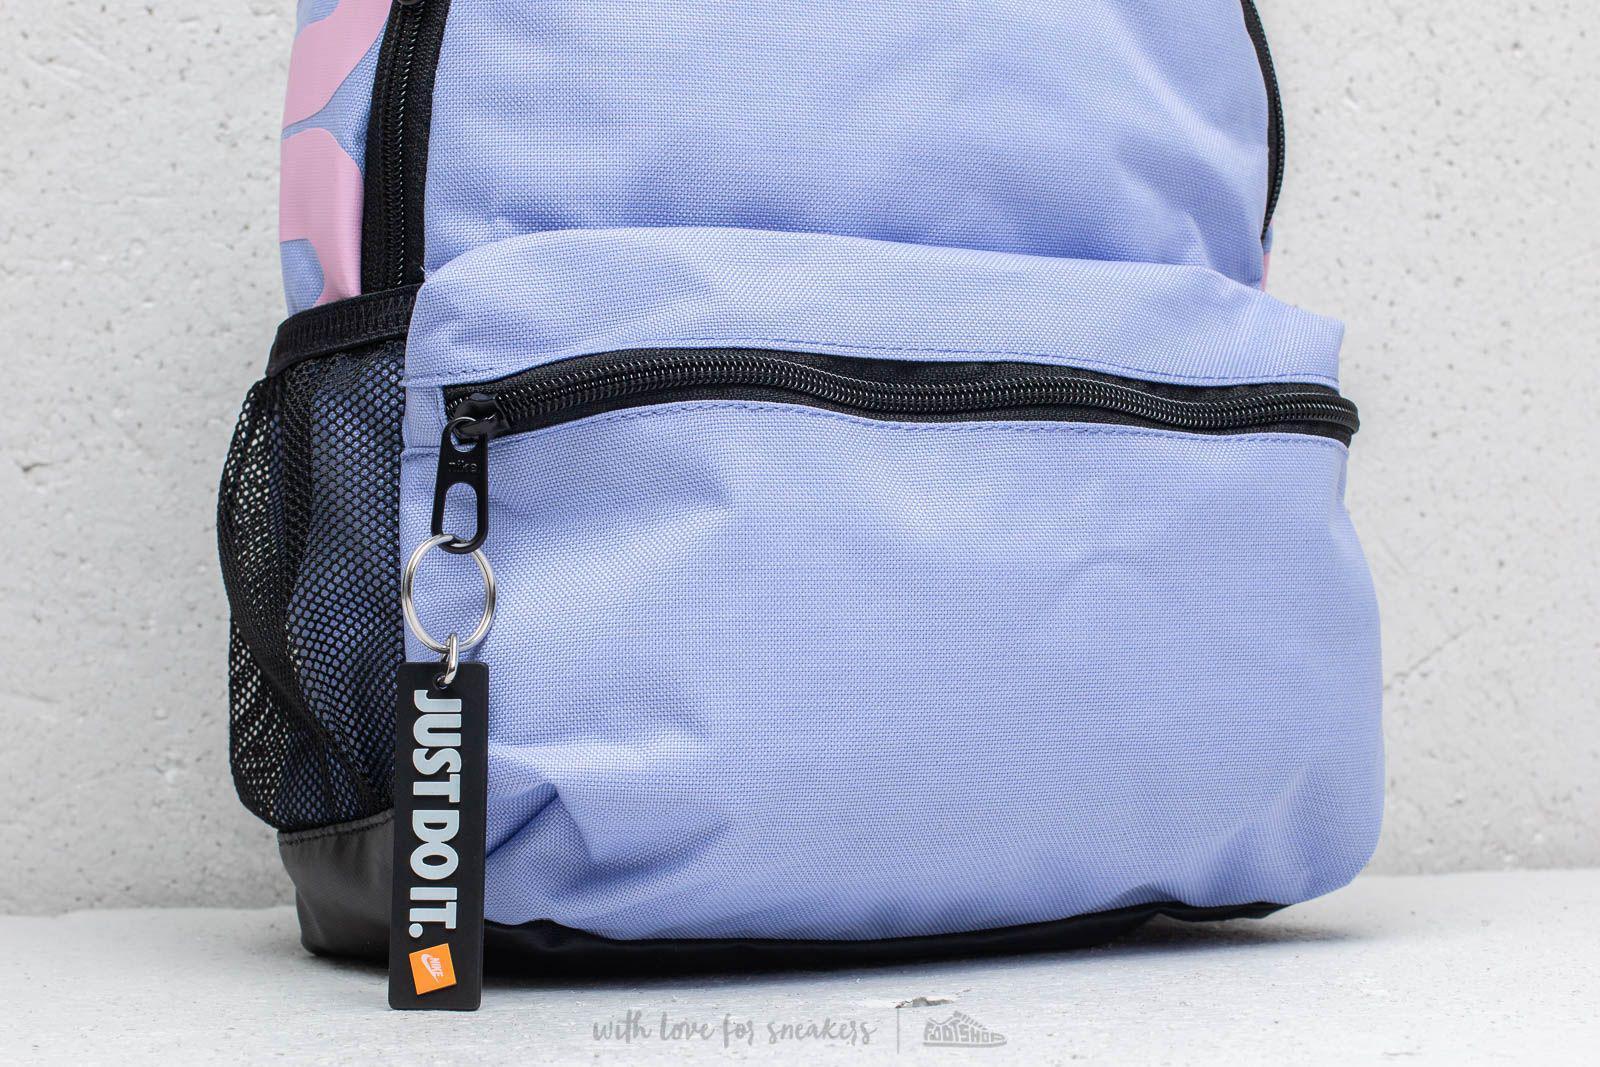 c96c0c2ce80b2 Nike Brasilia Just Do It Mini Backpack Purple  Pink in Blue - Lyst